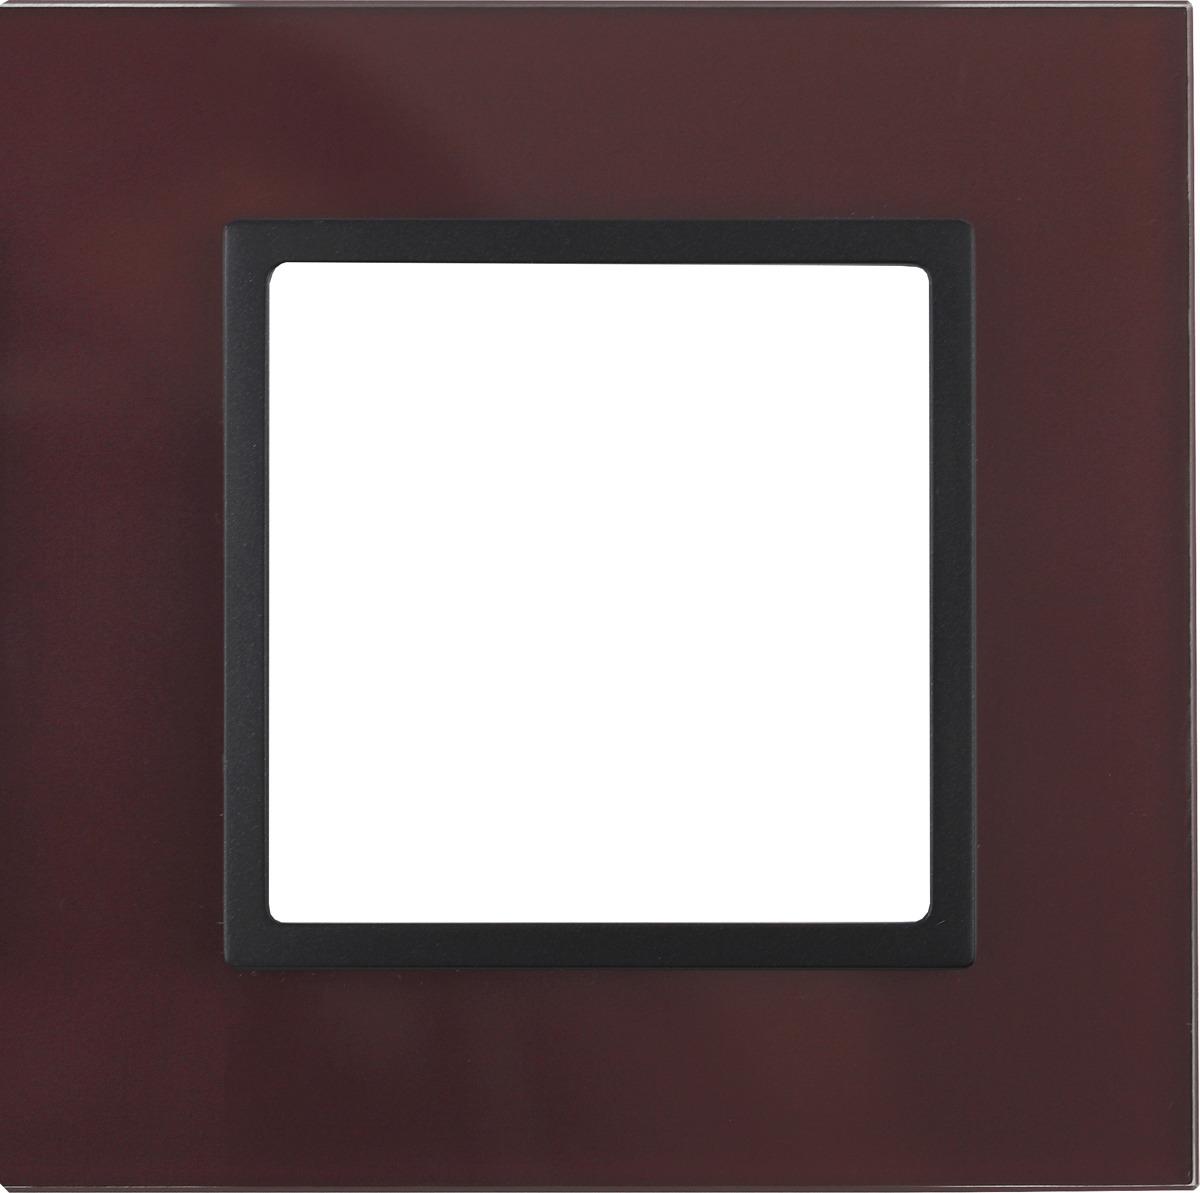 Рамка электроустановочная ЭРА Elegance, на 1 пост, 14-5101-25, бордовый, антрацит